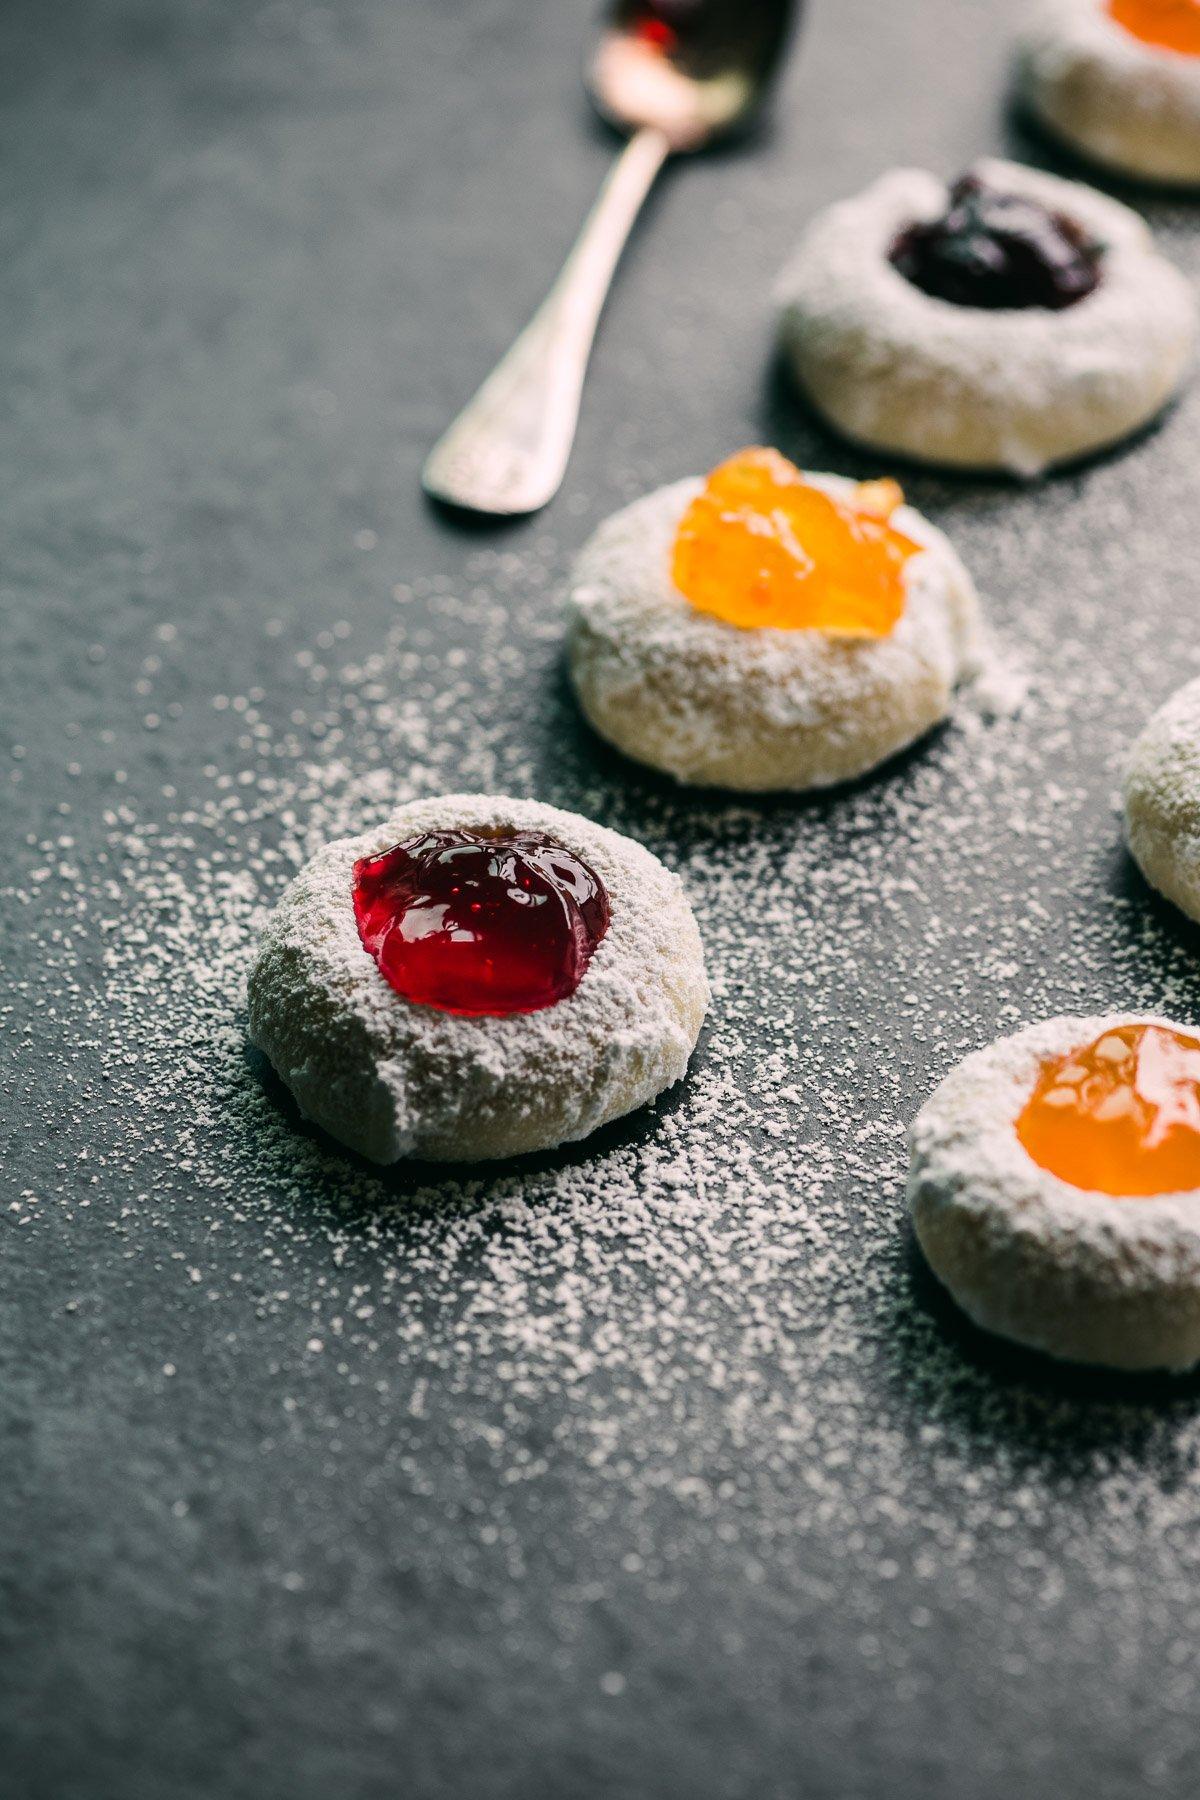 jam thumbprint cookies on a dark ground